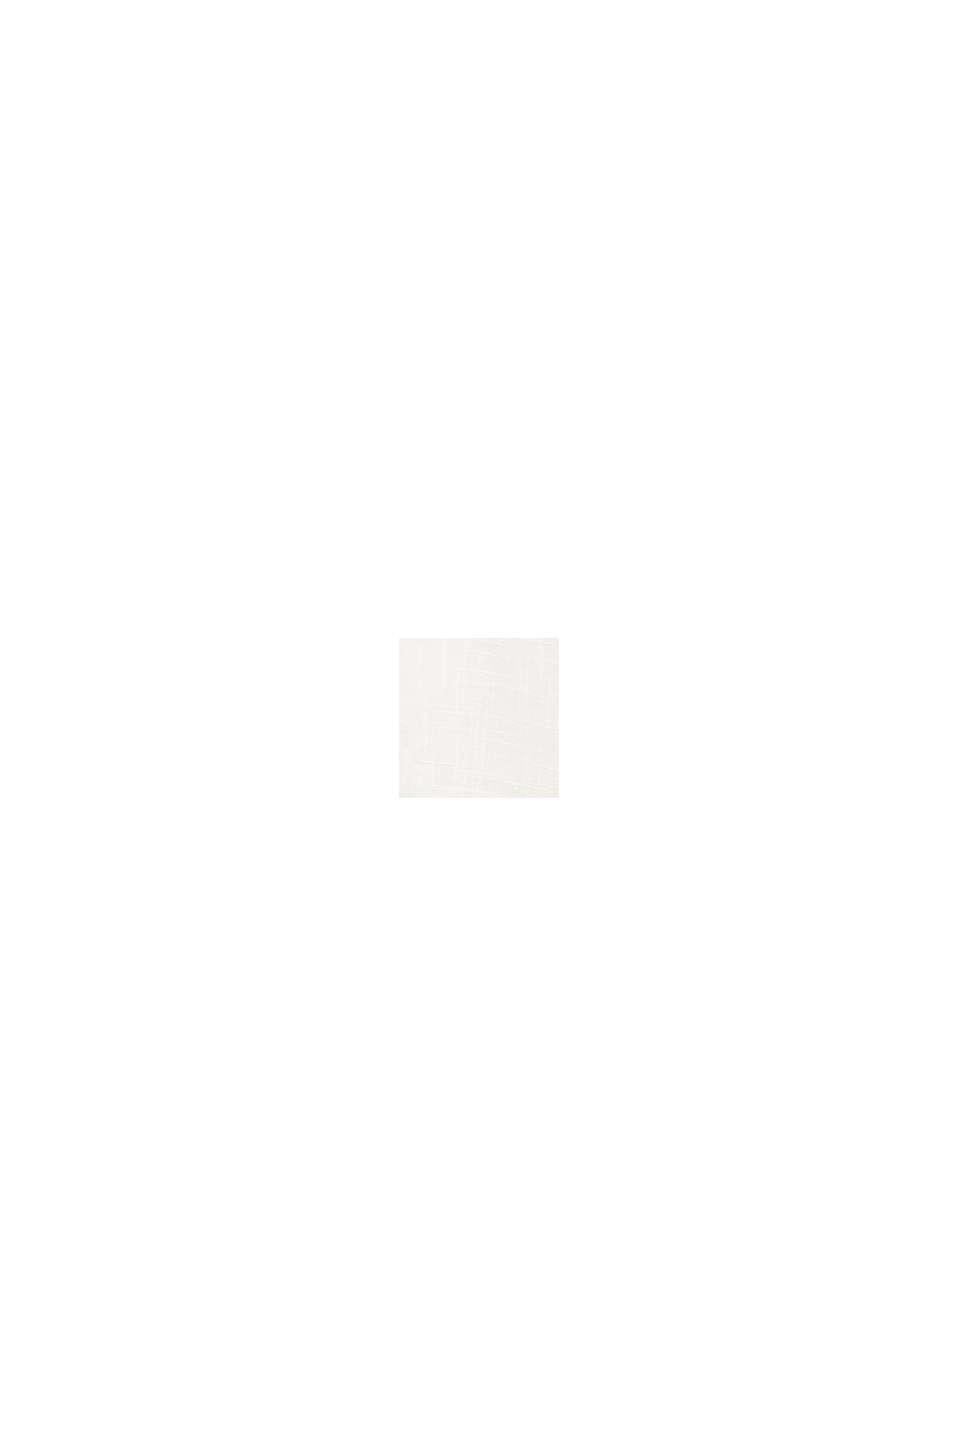 Blousetop met V-hals, OFF WHITE, swatch